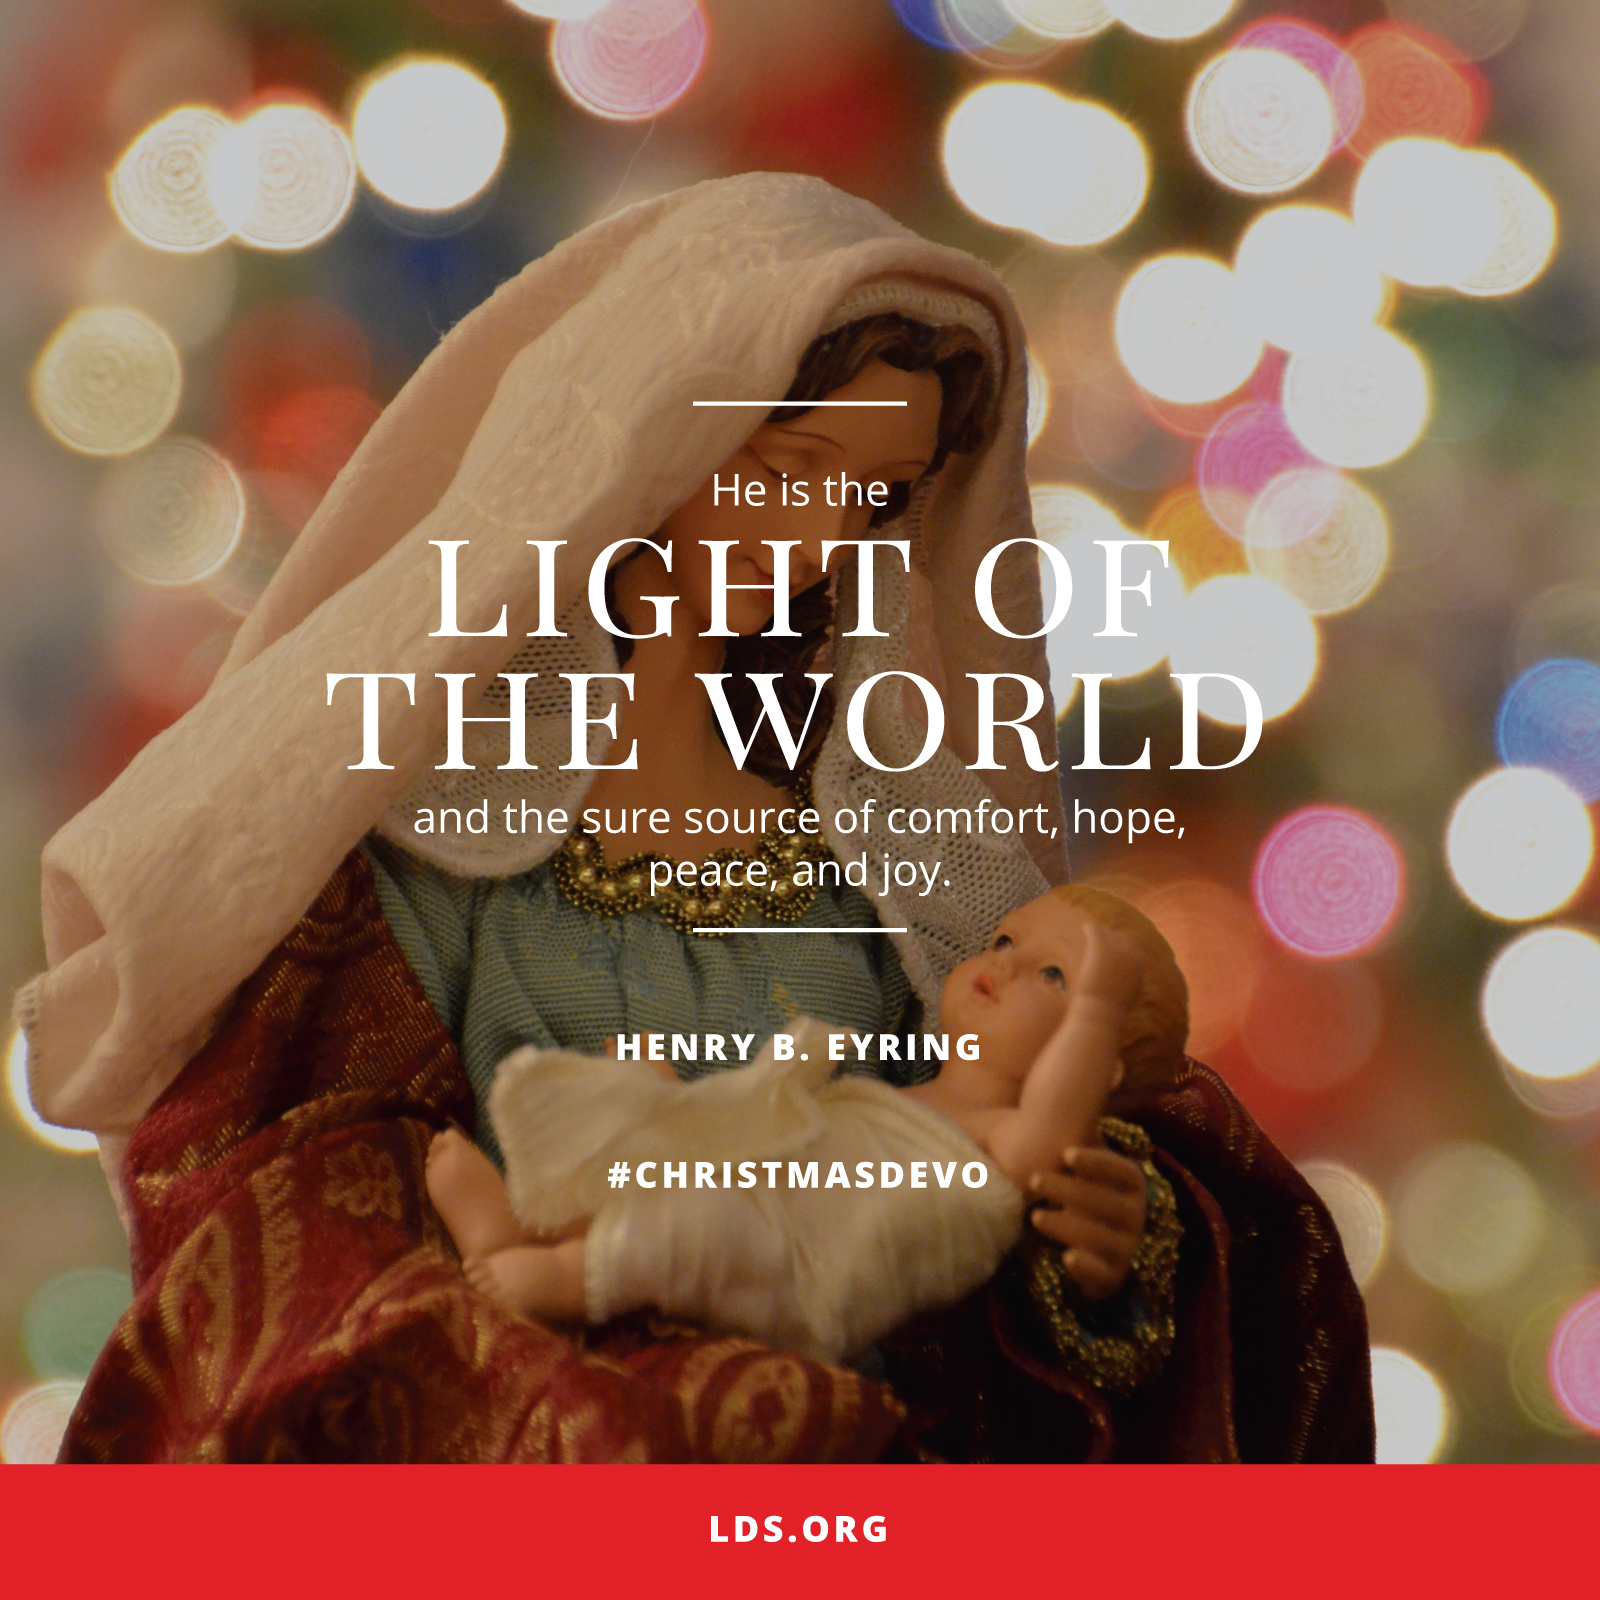 109 Best Christmas Lds Images On Pinterest: Light Of The World